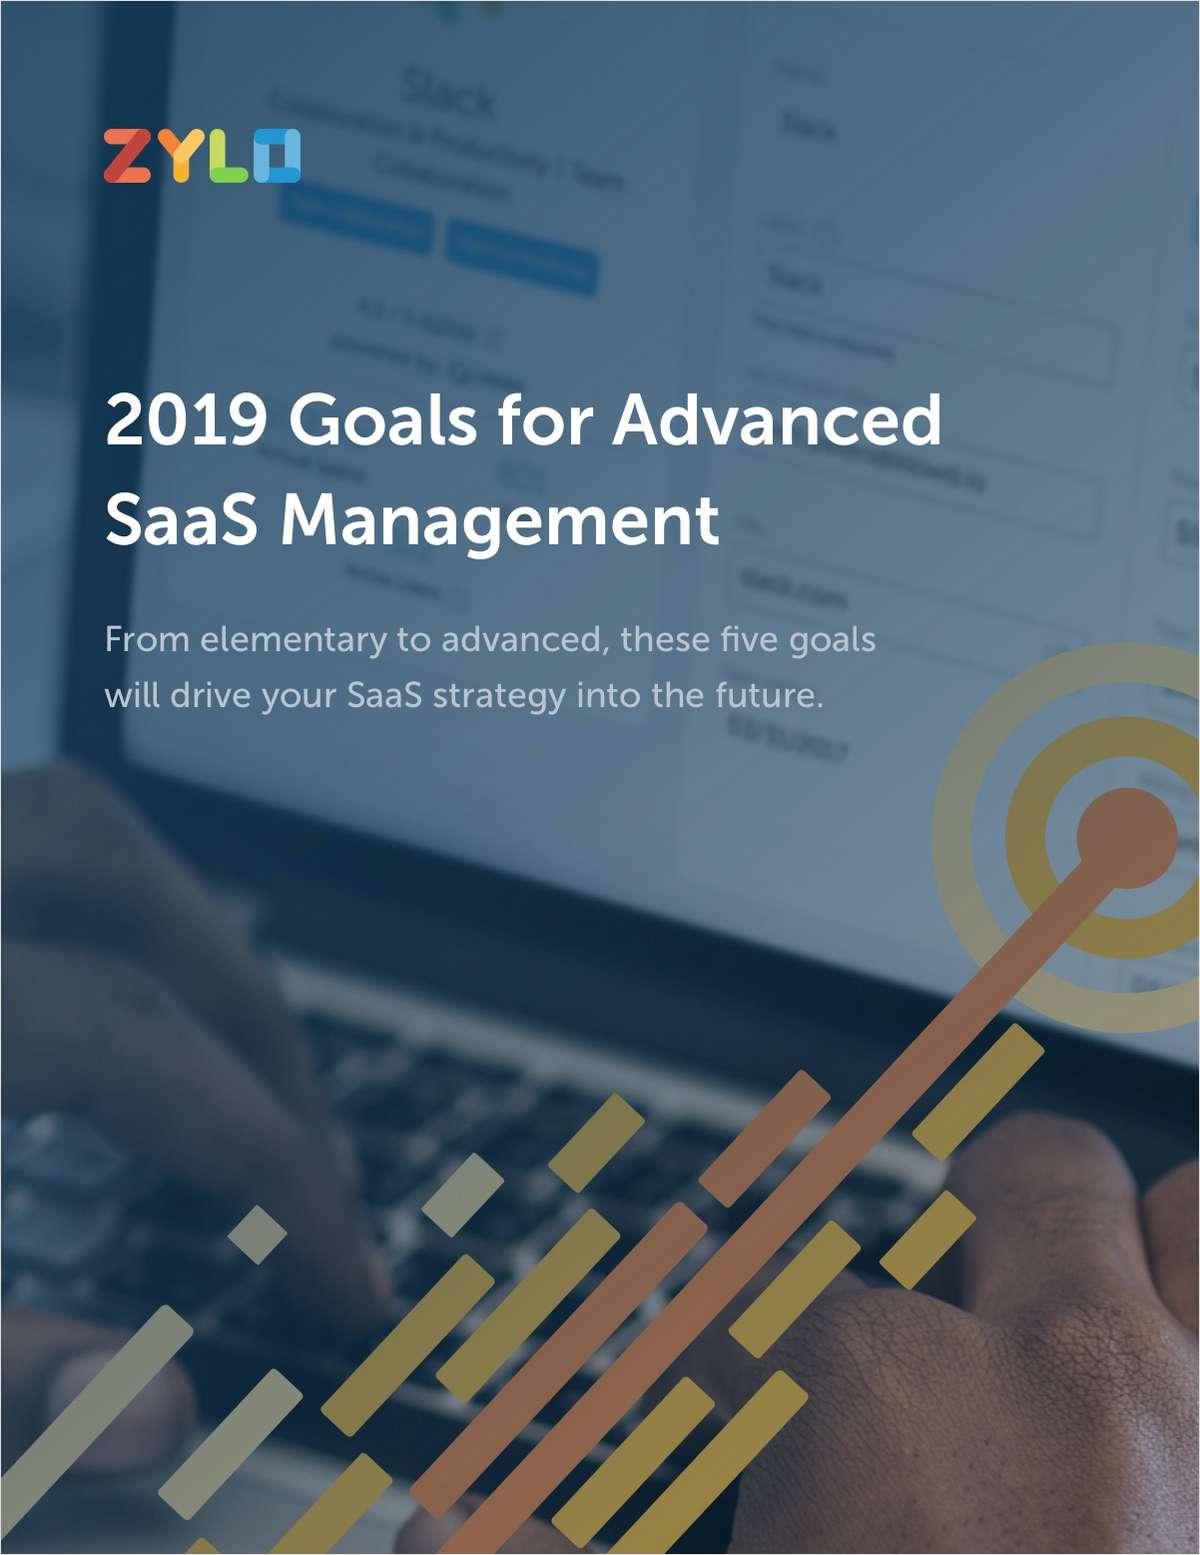 2019 Goals for Advanced SaaS Management